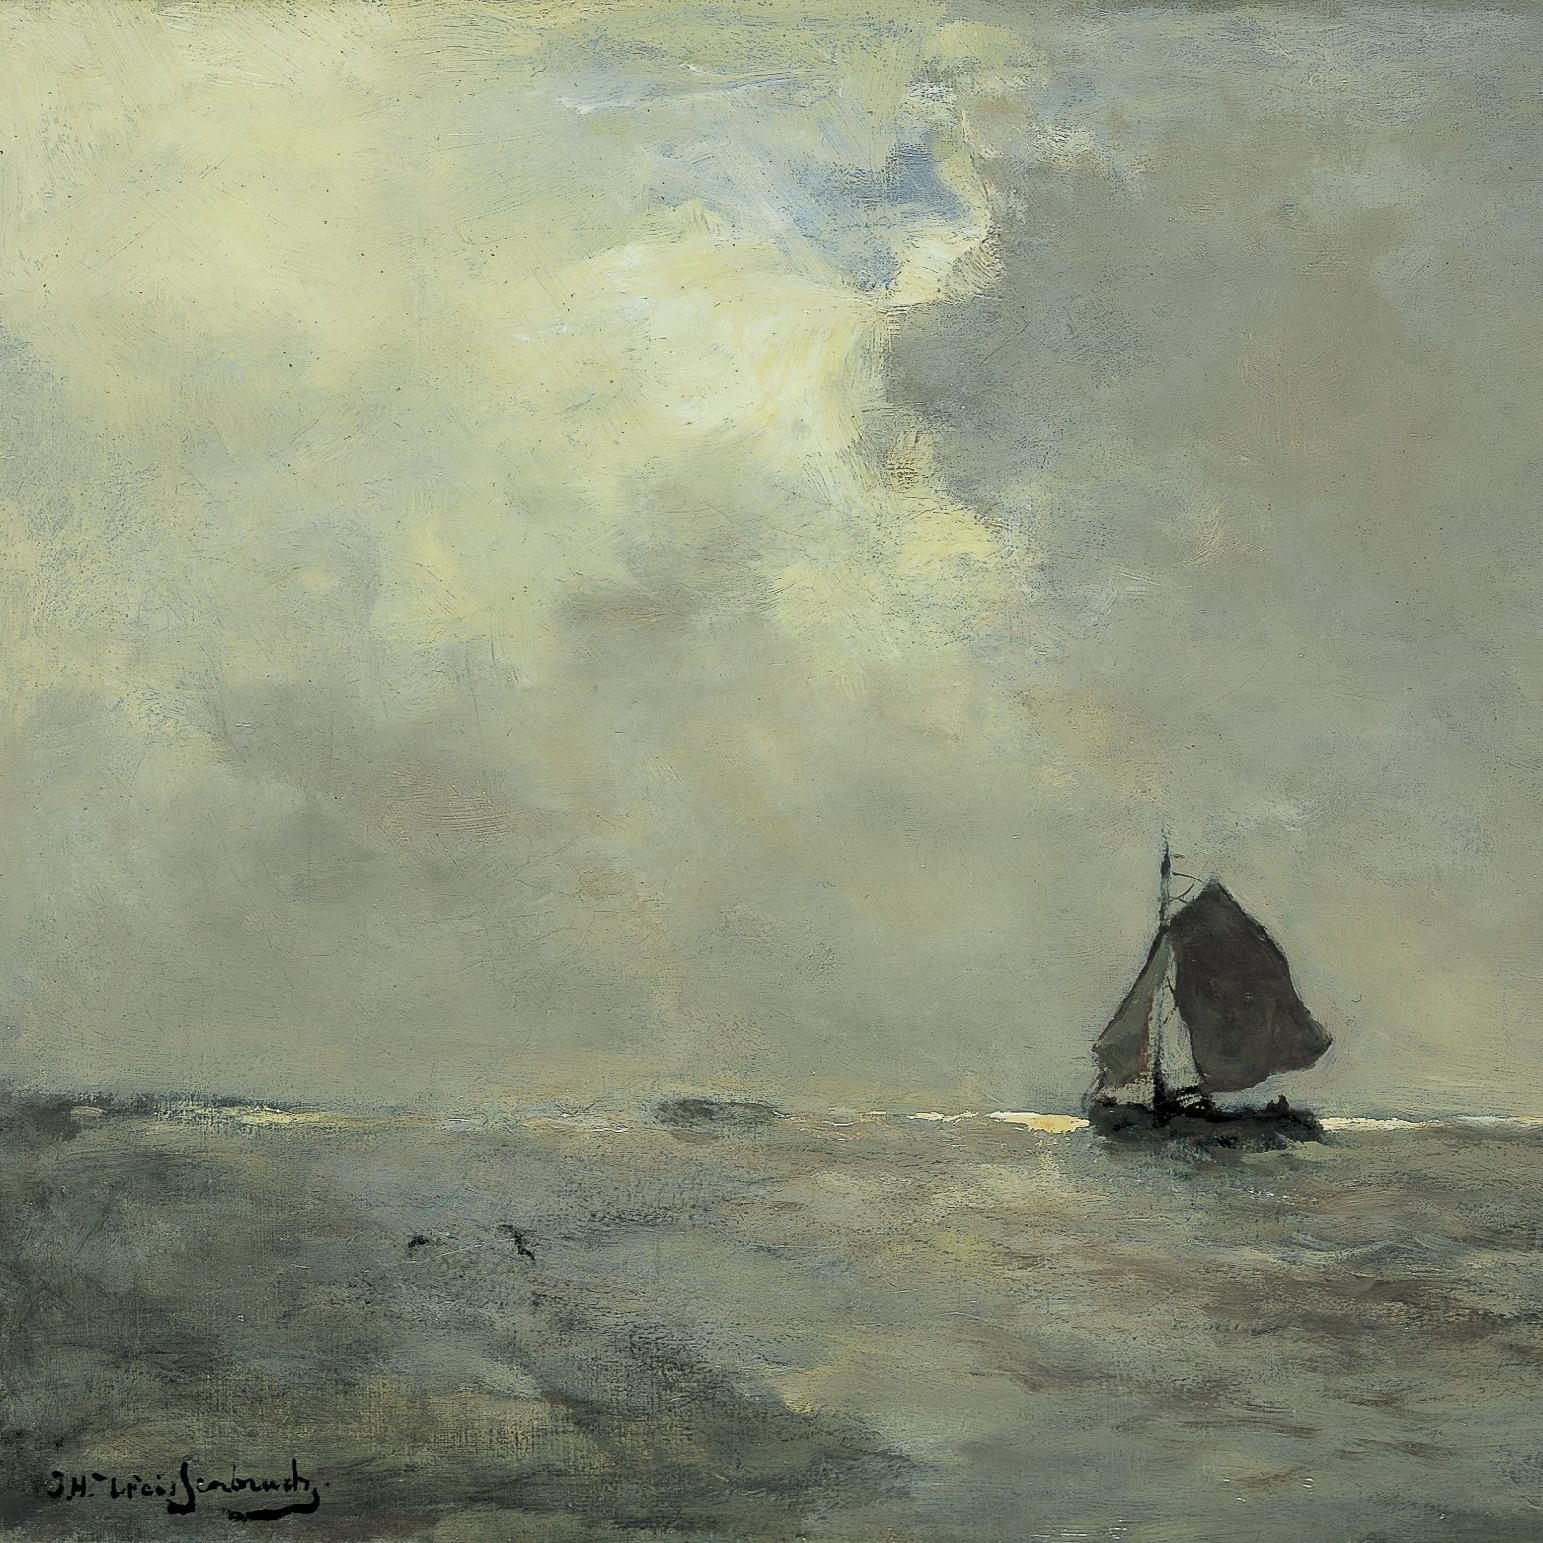 Bard 12, Jan Hendrik Weissenbruch